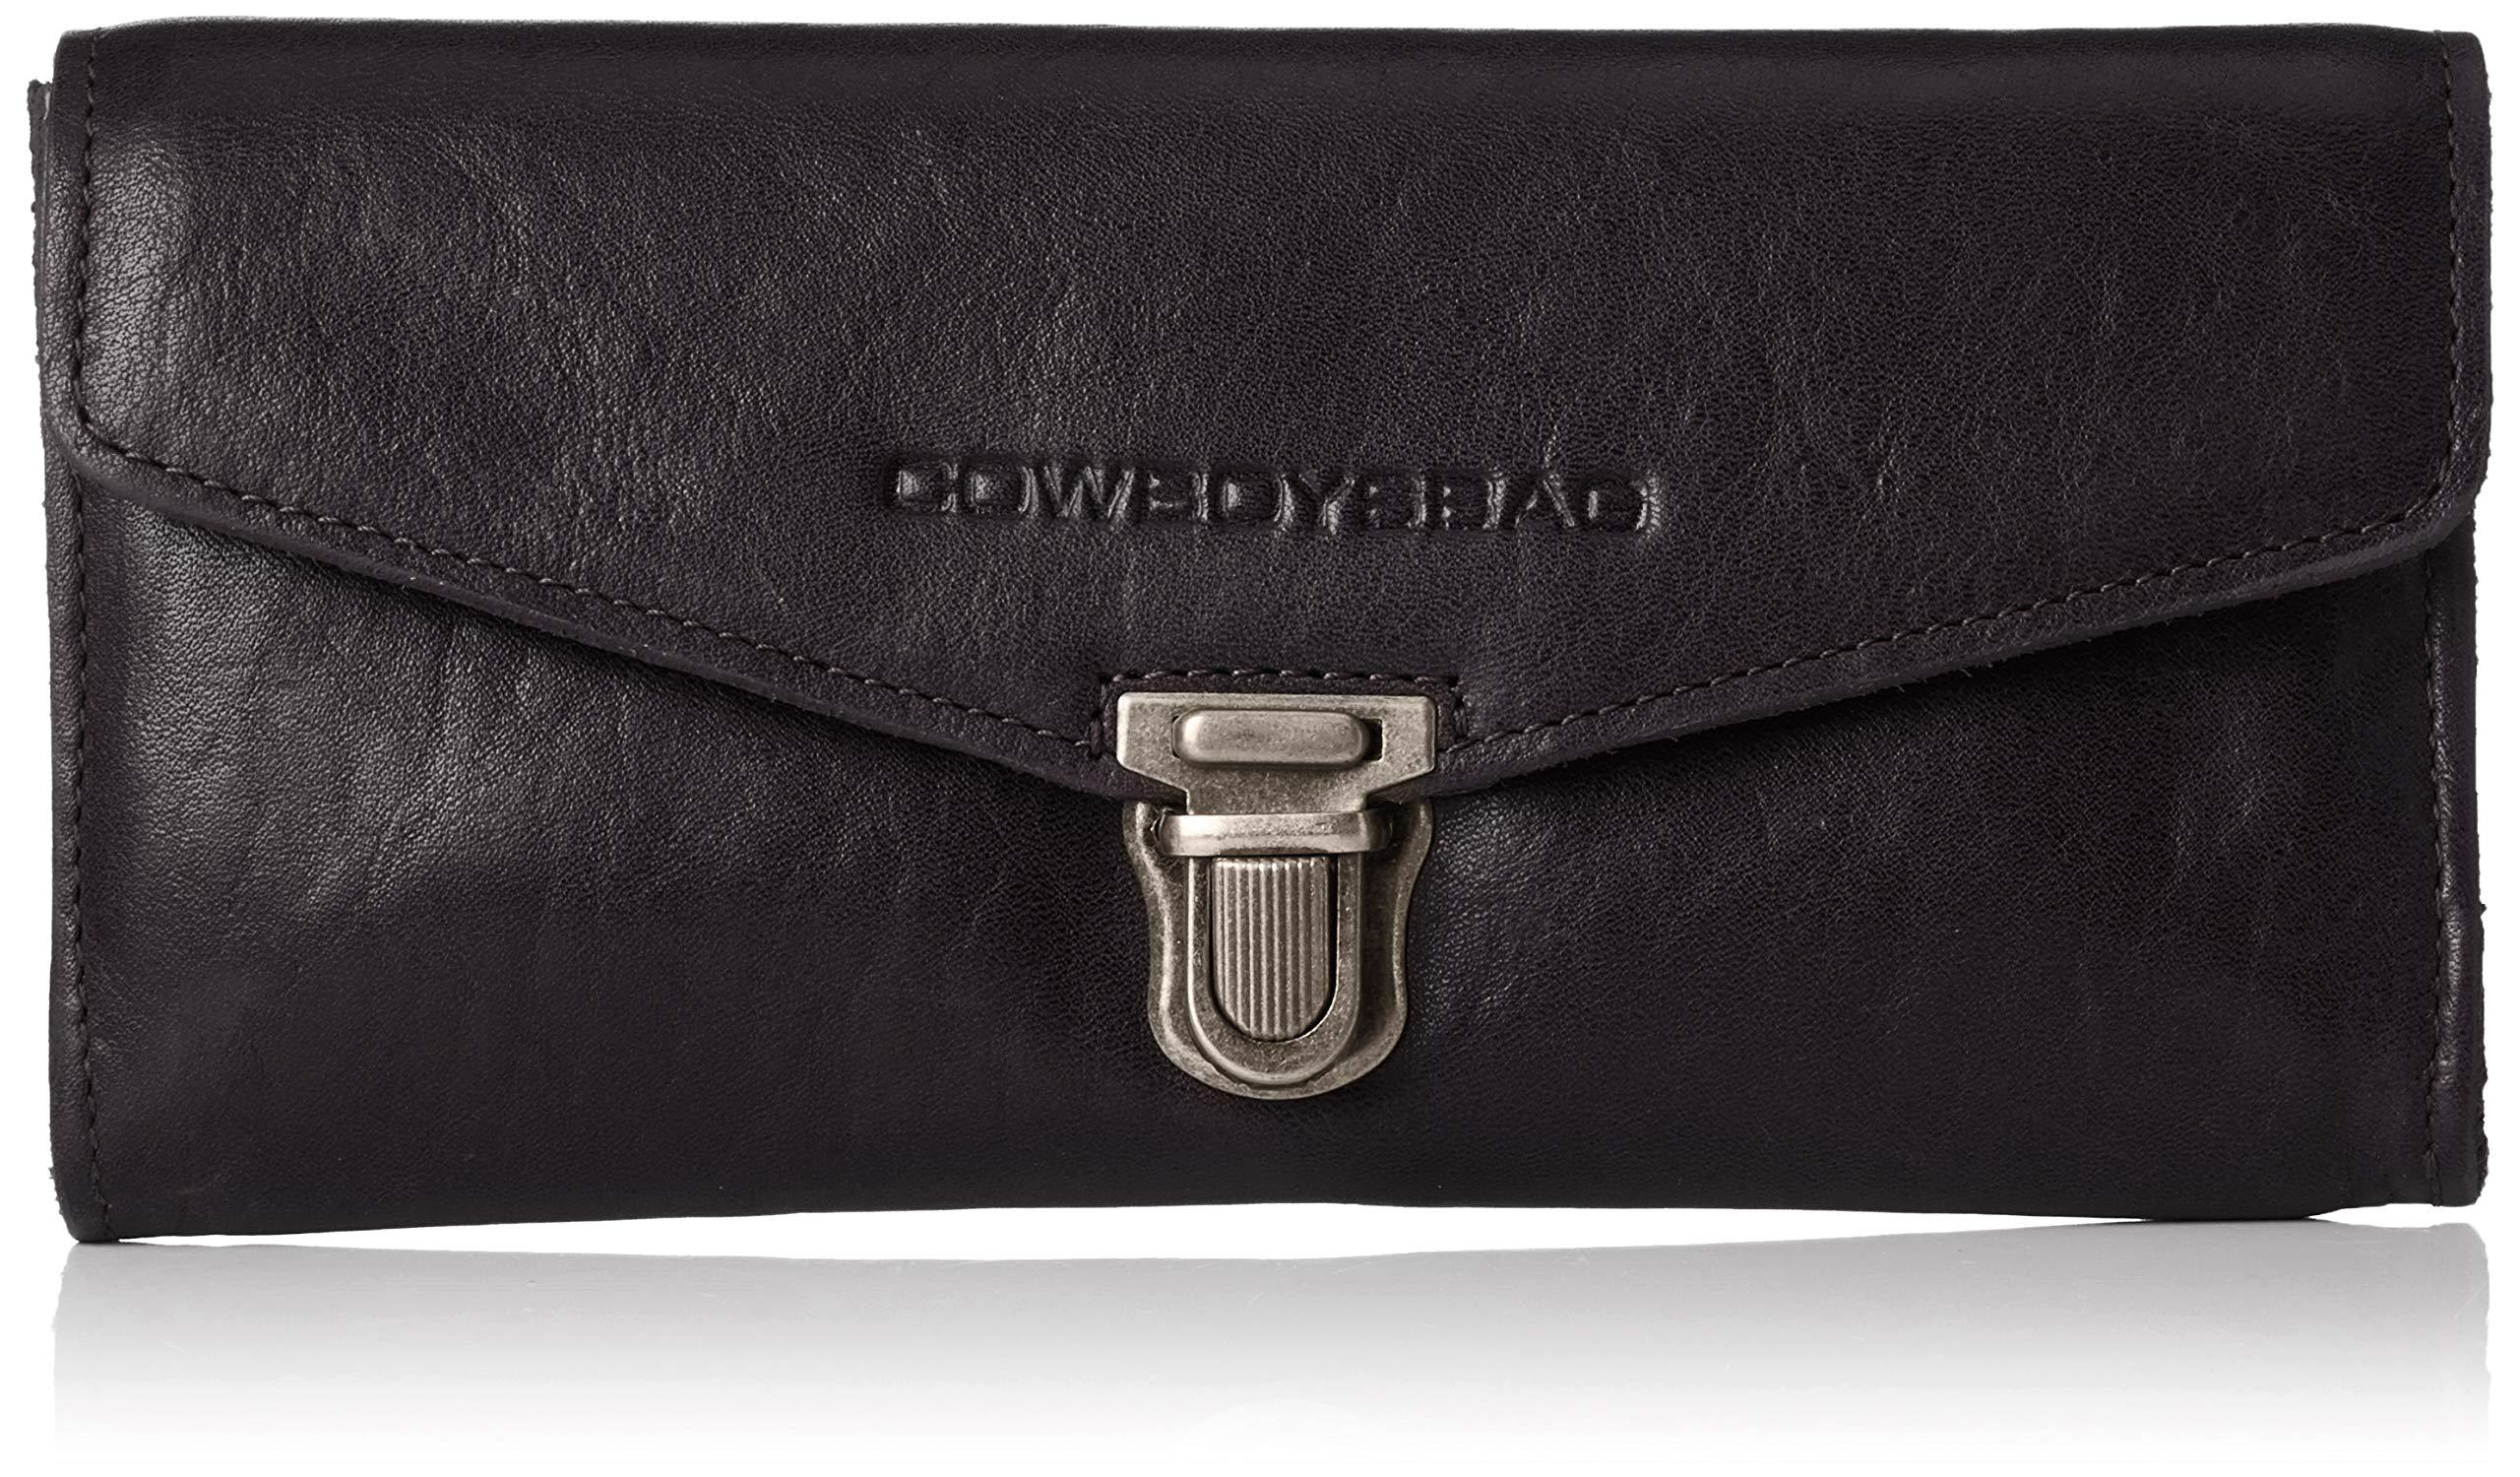 5 Cowboysbag Purse FemmeNoir000100Black2x9 Cmb Crédit H DrewPorte De X T cartes 5x9 5RALqj34